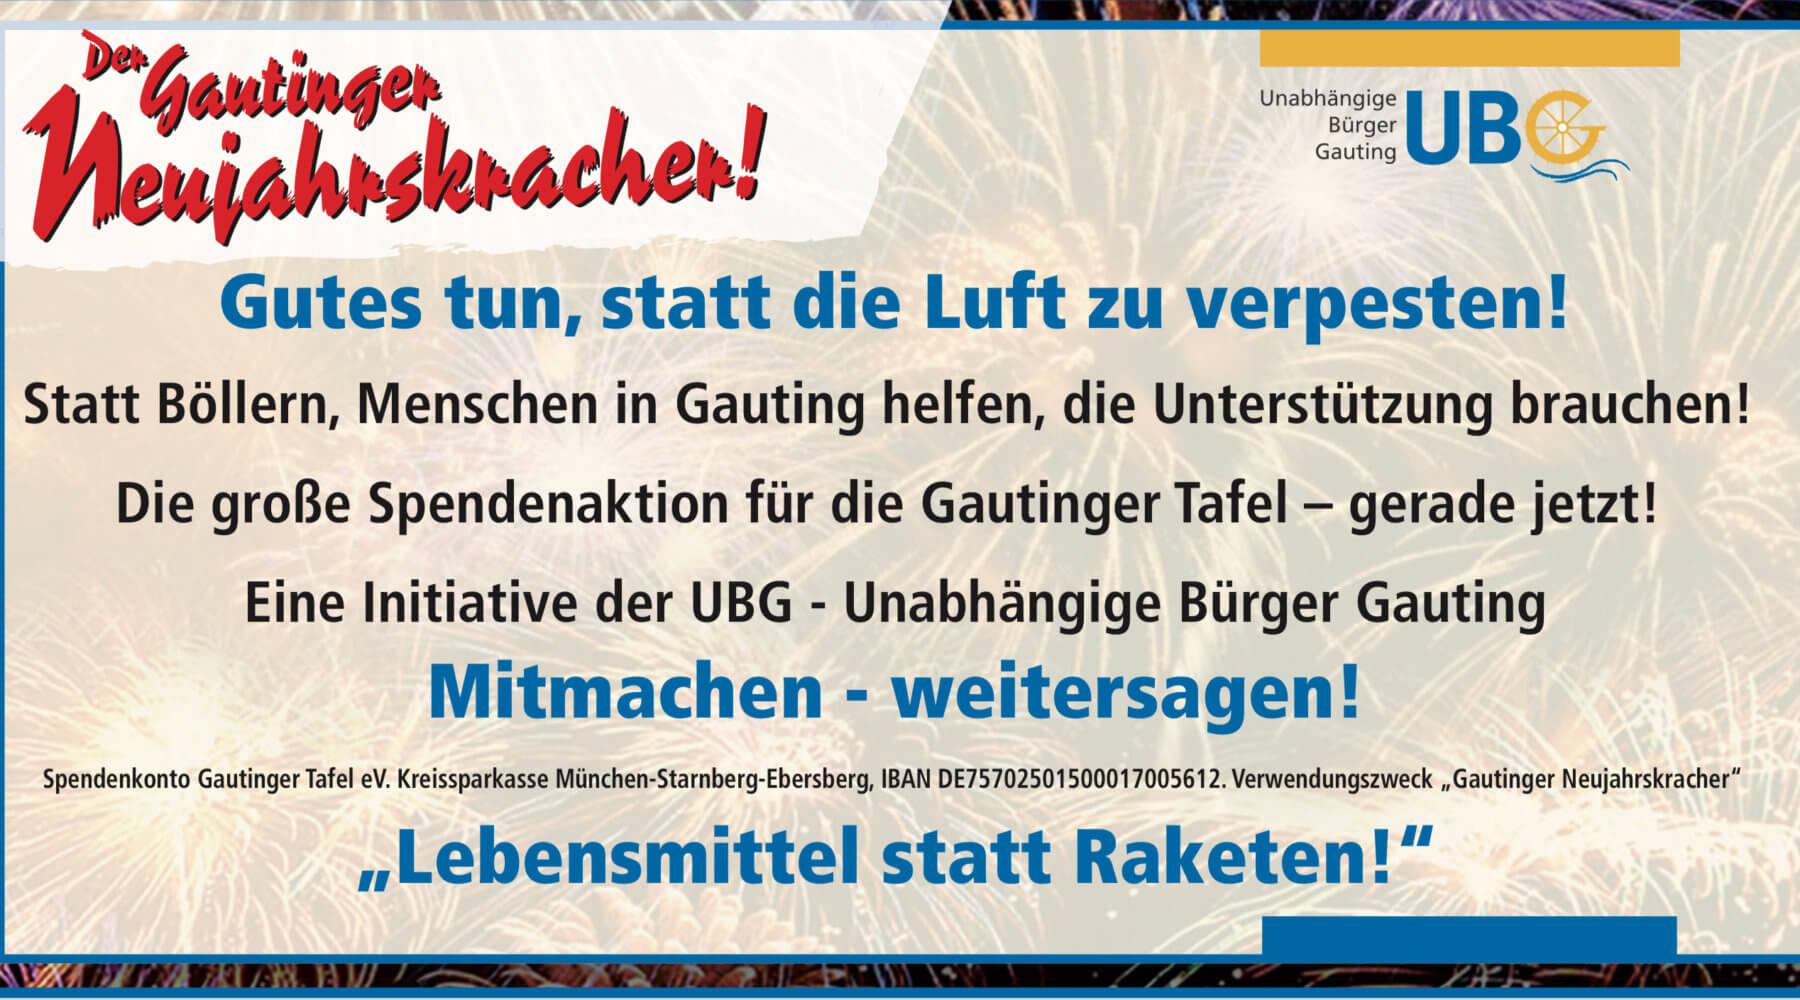 Spenden für die Gautinger Tafel statt Silvesterböller !